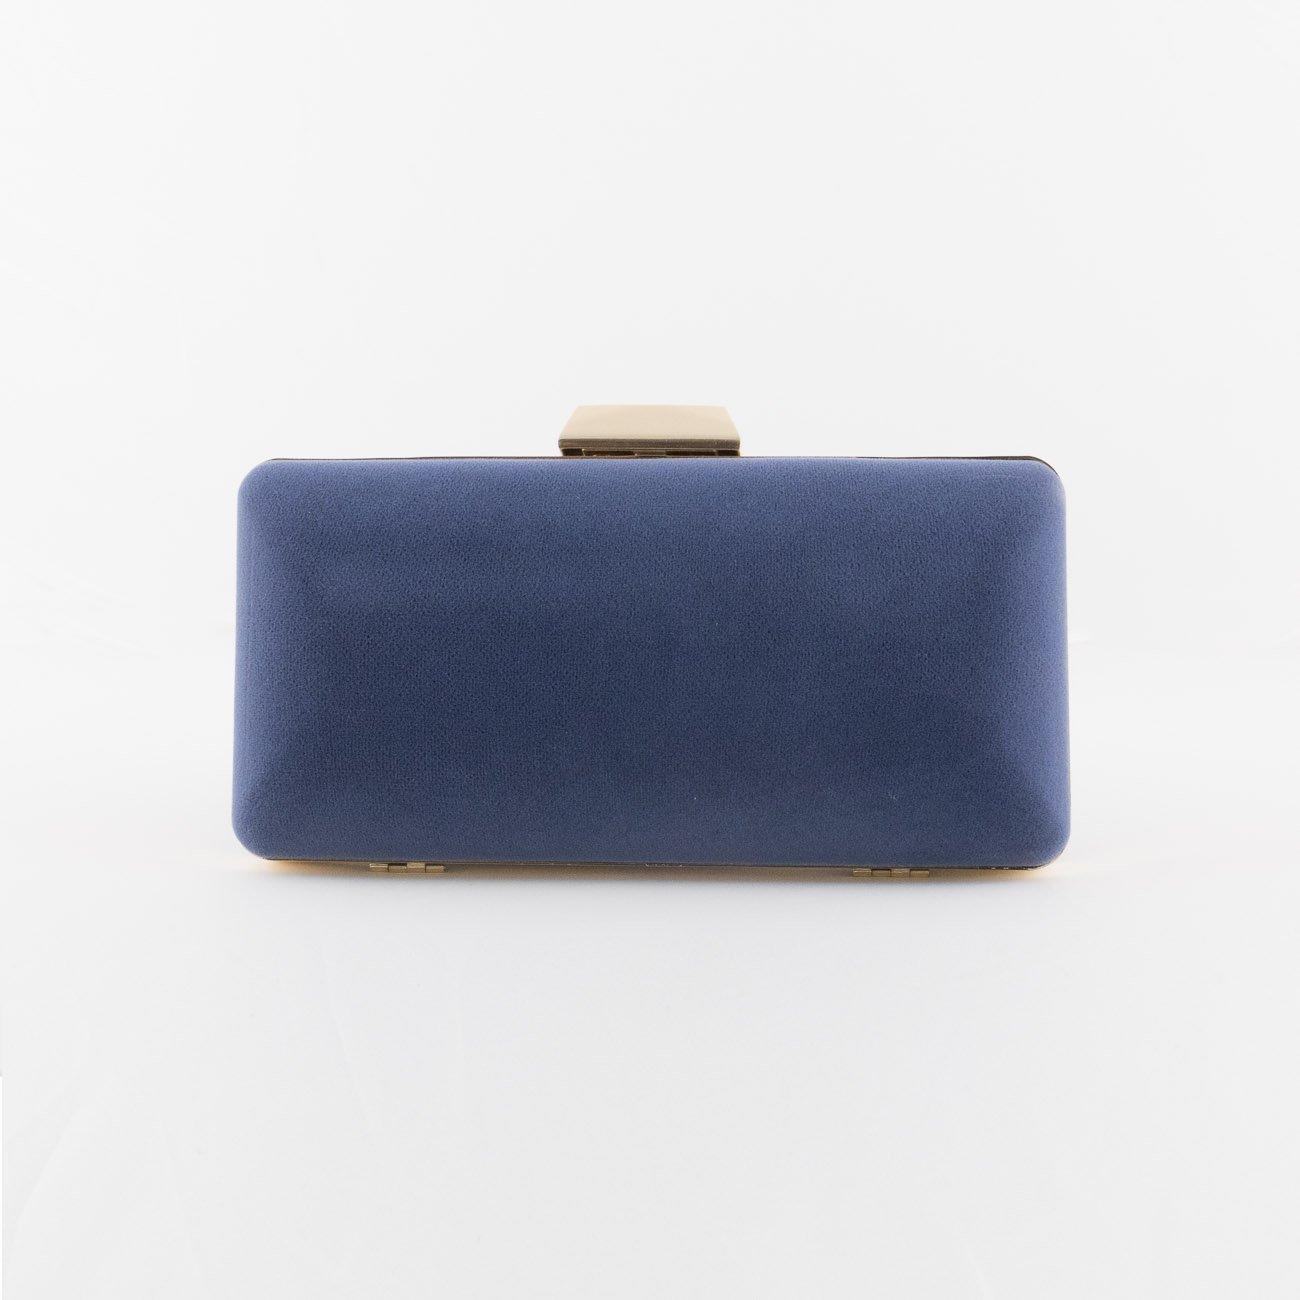 9b9eb51e Bolso Clutch de Fiesta color azul